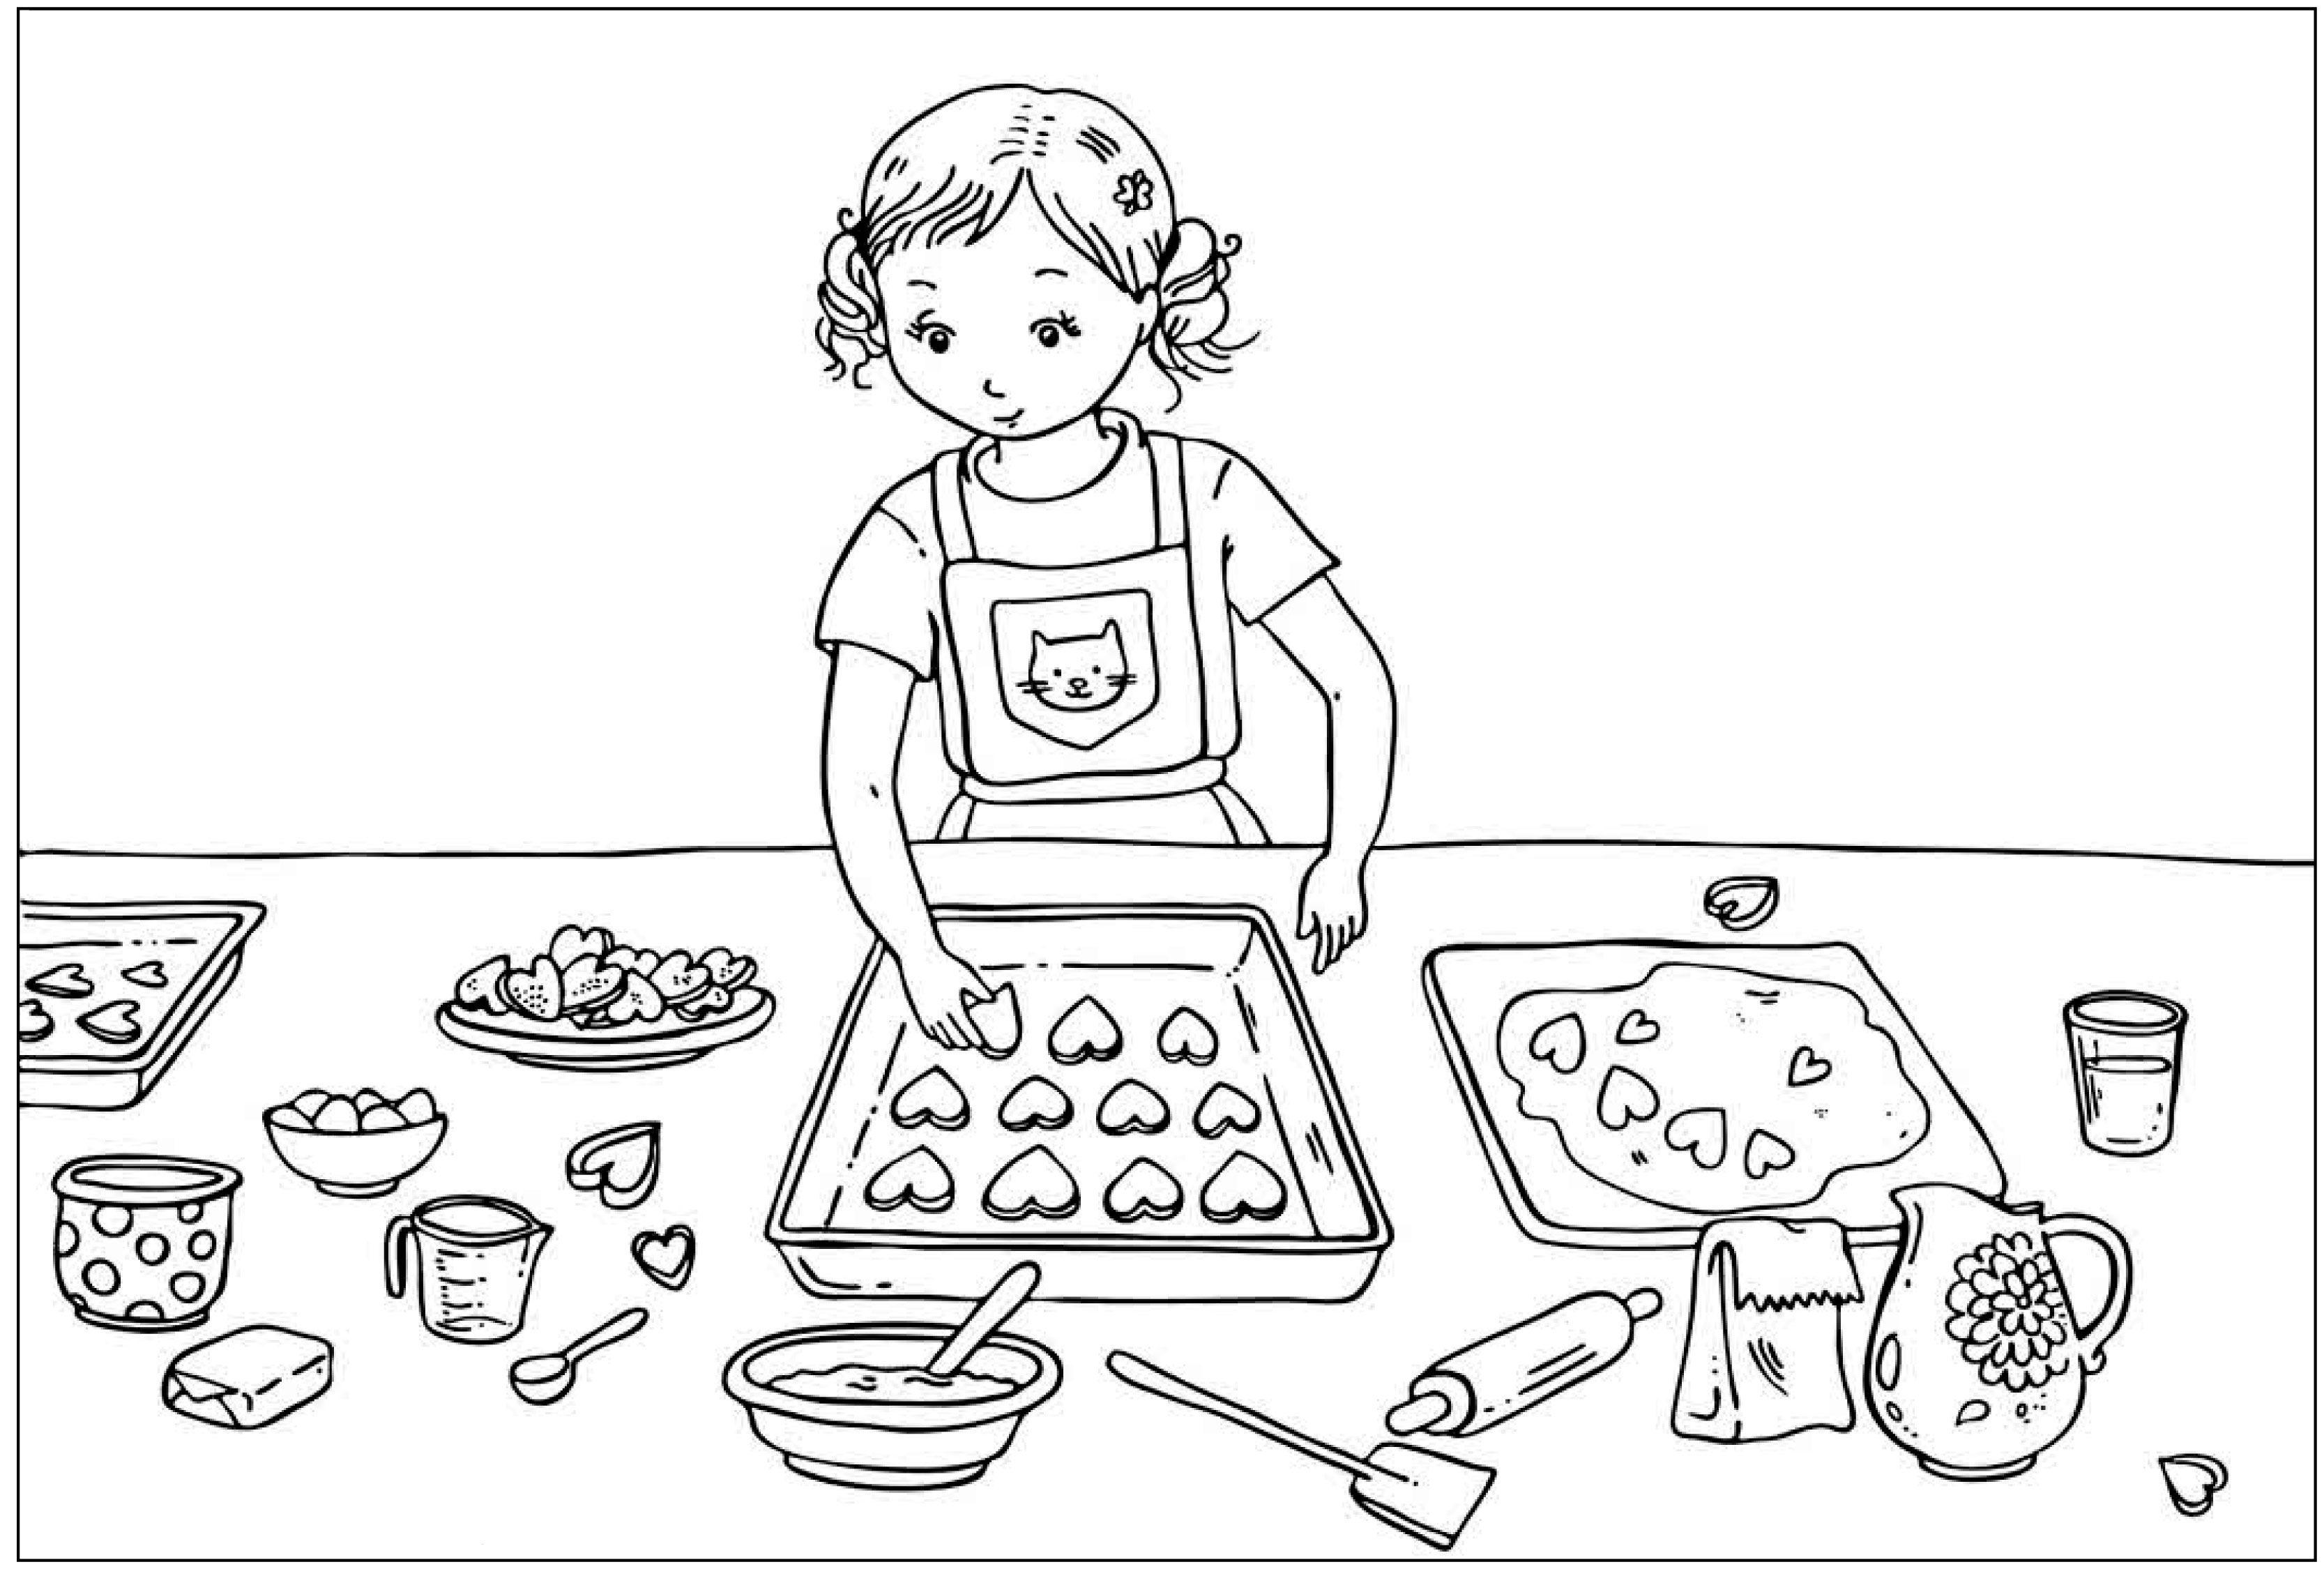 Kekse Ausmalbilder Fur Kinder